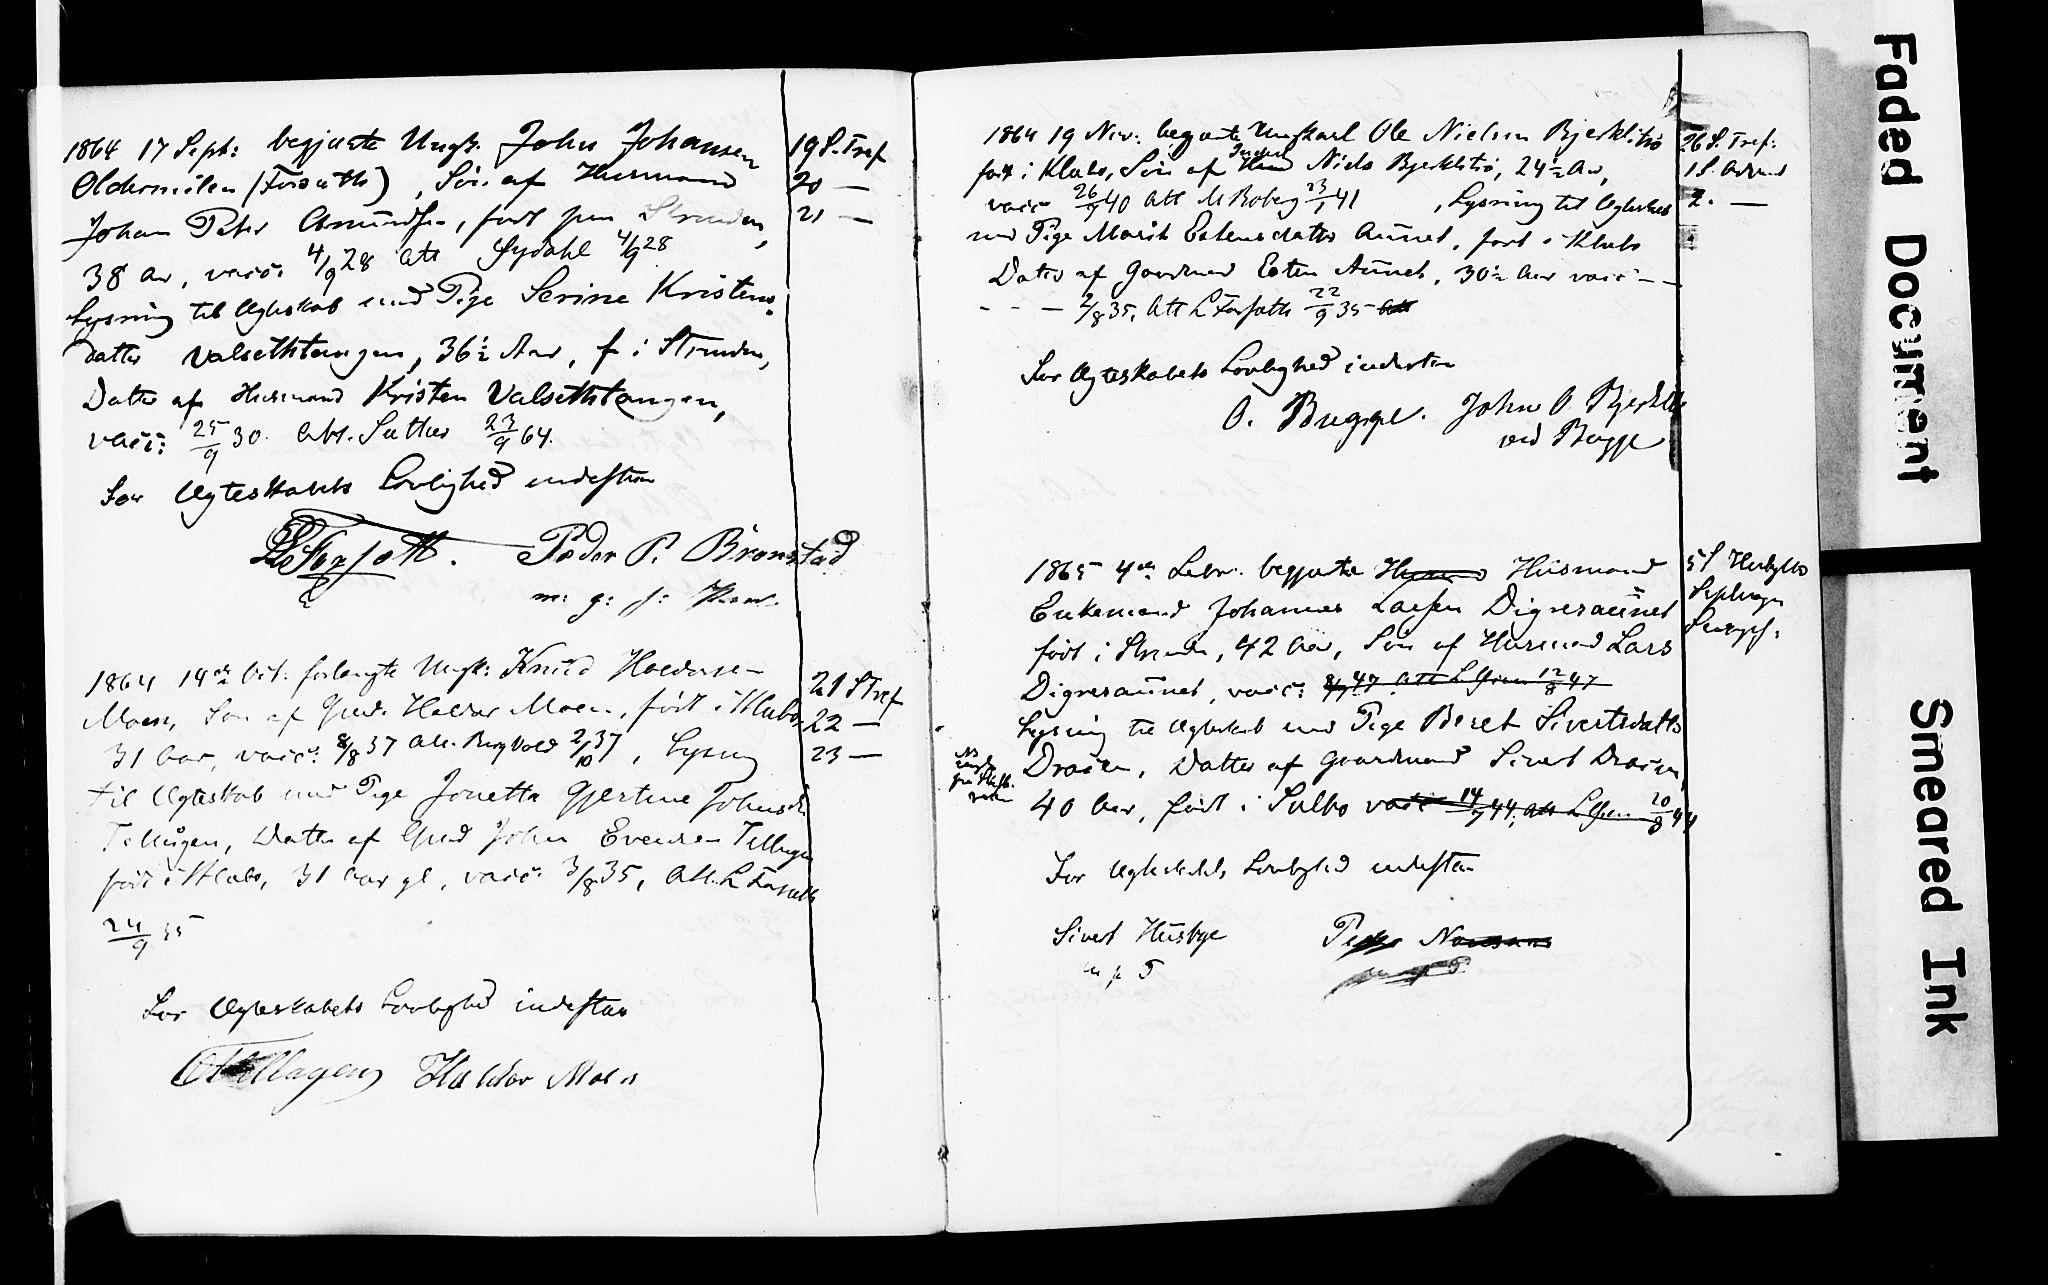 SAT, Ministerialprotokoller, klokkerbøker og fødselsregistre - Sør-Trøndelag, 618/L0445: Banns register no. 618A08, 1863-1898